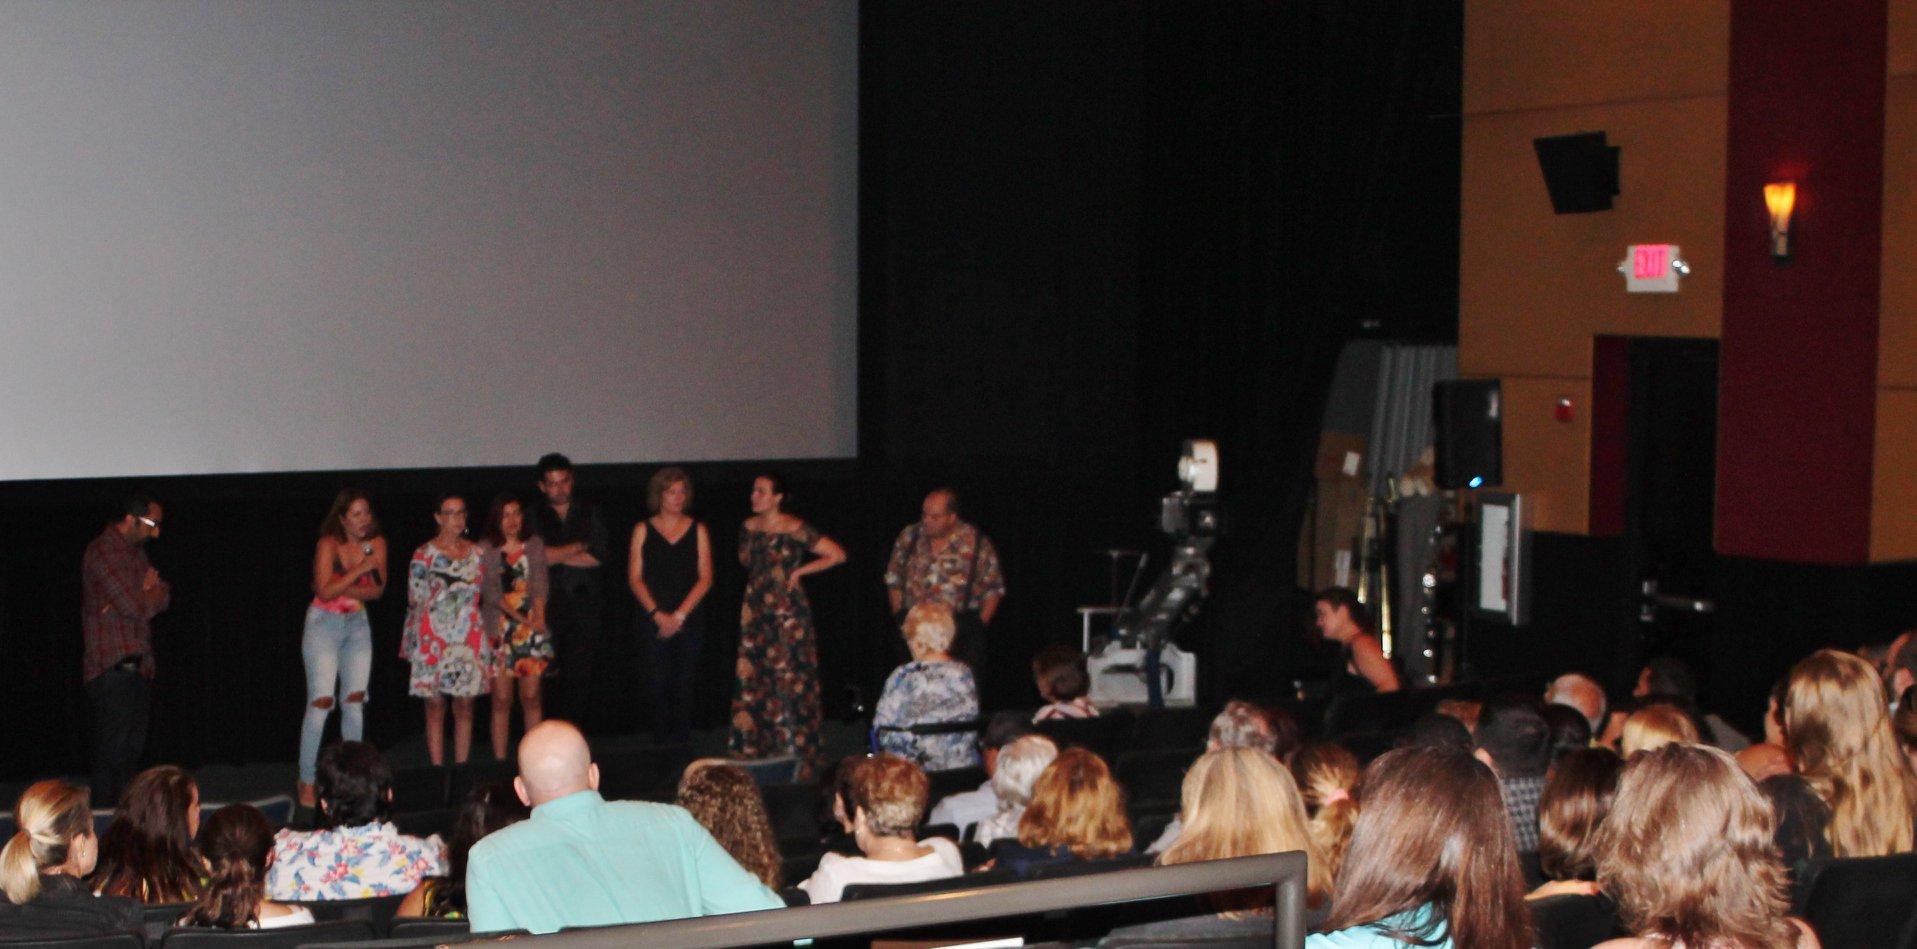 Second screening at Gables Cinema!